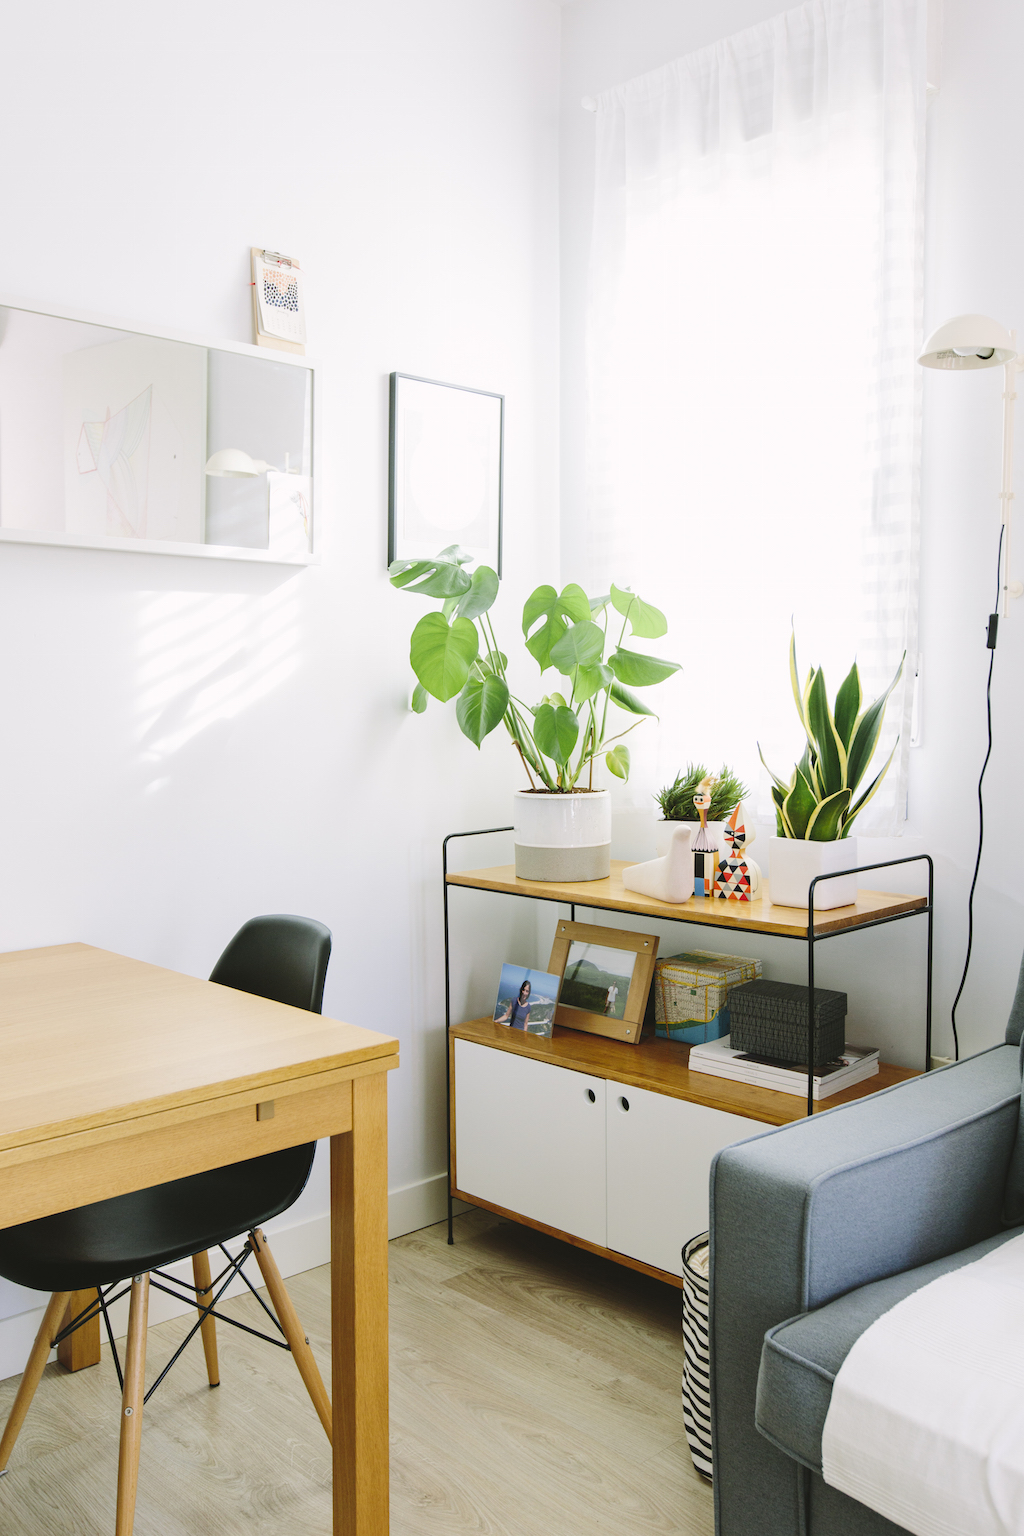 Picapino-mueble-television-nordico-madera-4